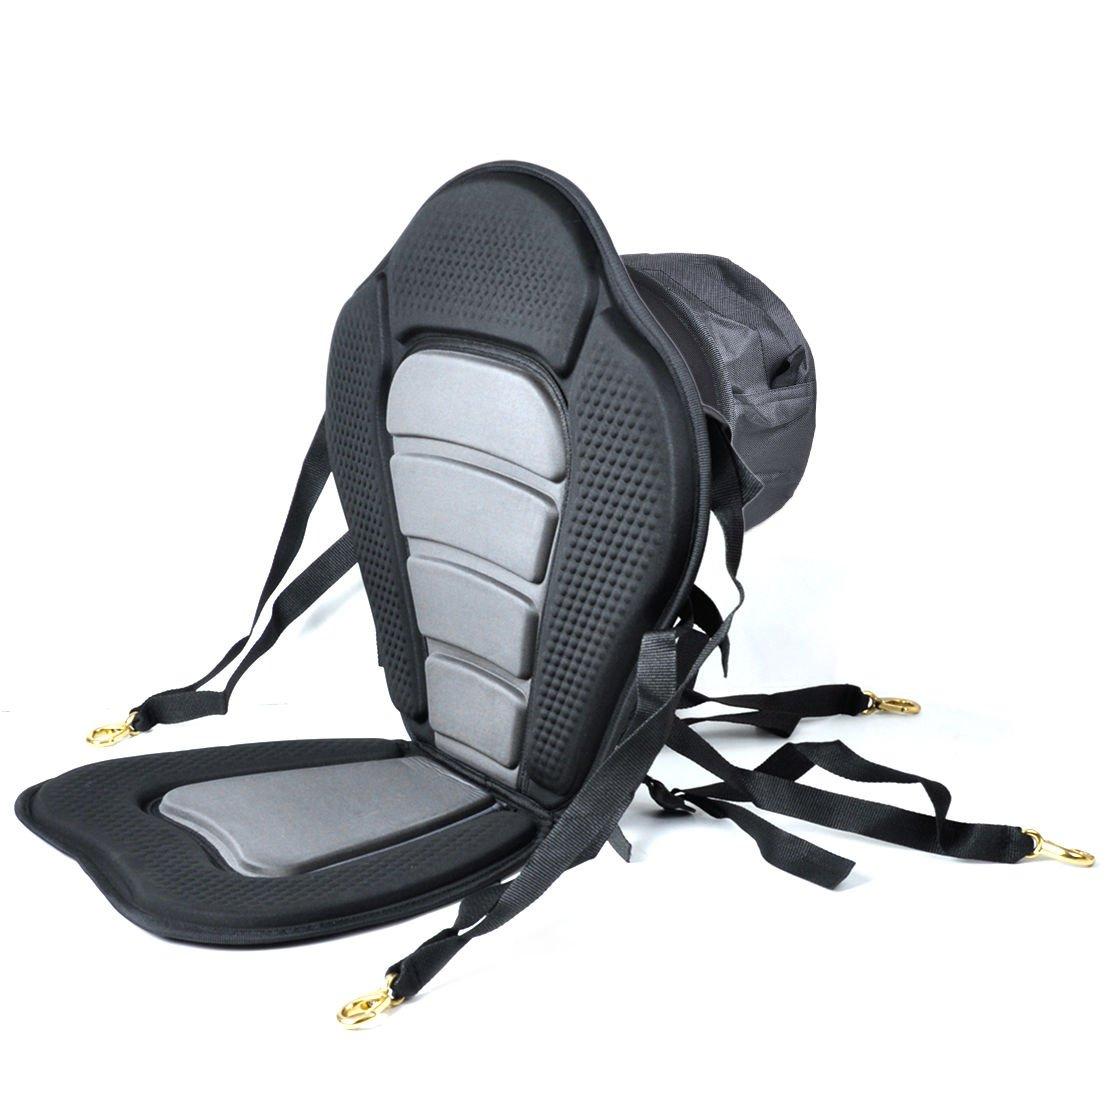 iGuerburn Adjustable Padded Kayak Boat Seat with Detachable Canoe Backrest Seat Bag - kayak seats